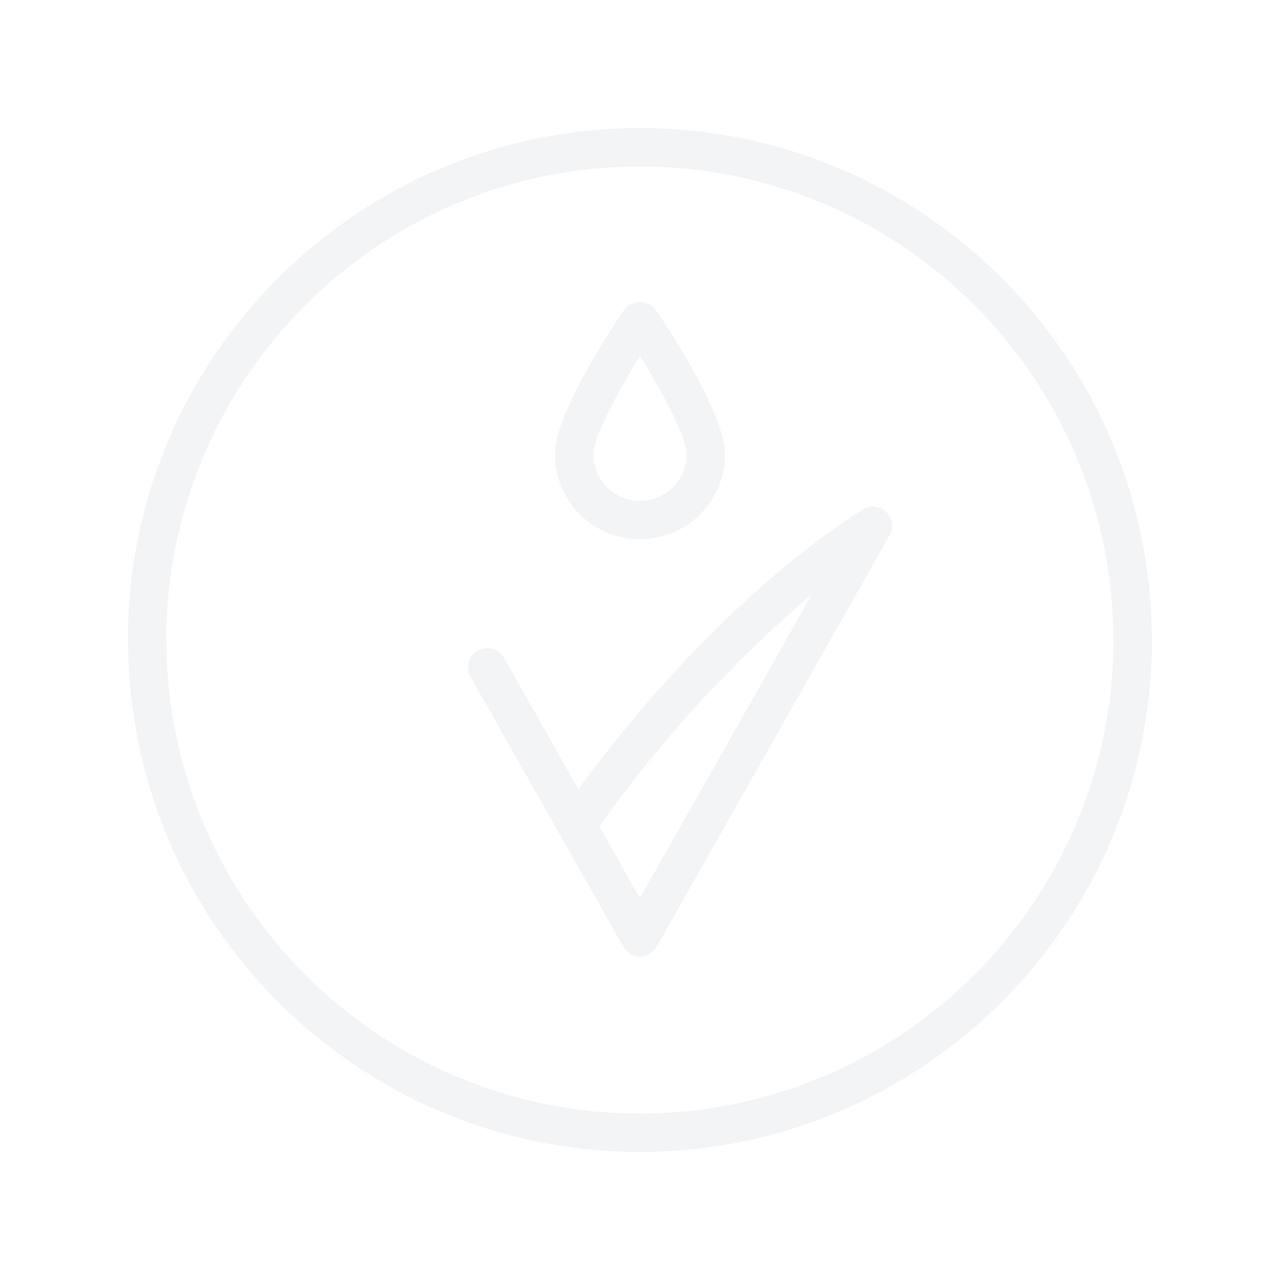 Helena Rubinstein Nudit Anti-Prespirant Roll-On Deodorant 50ml